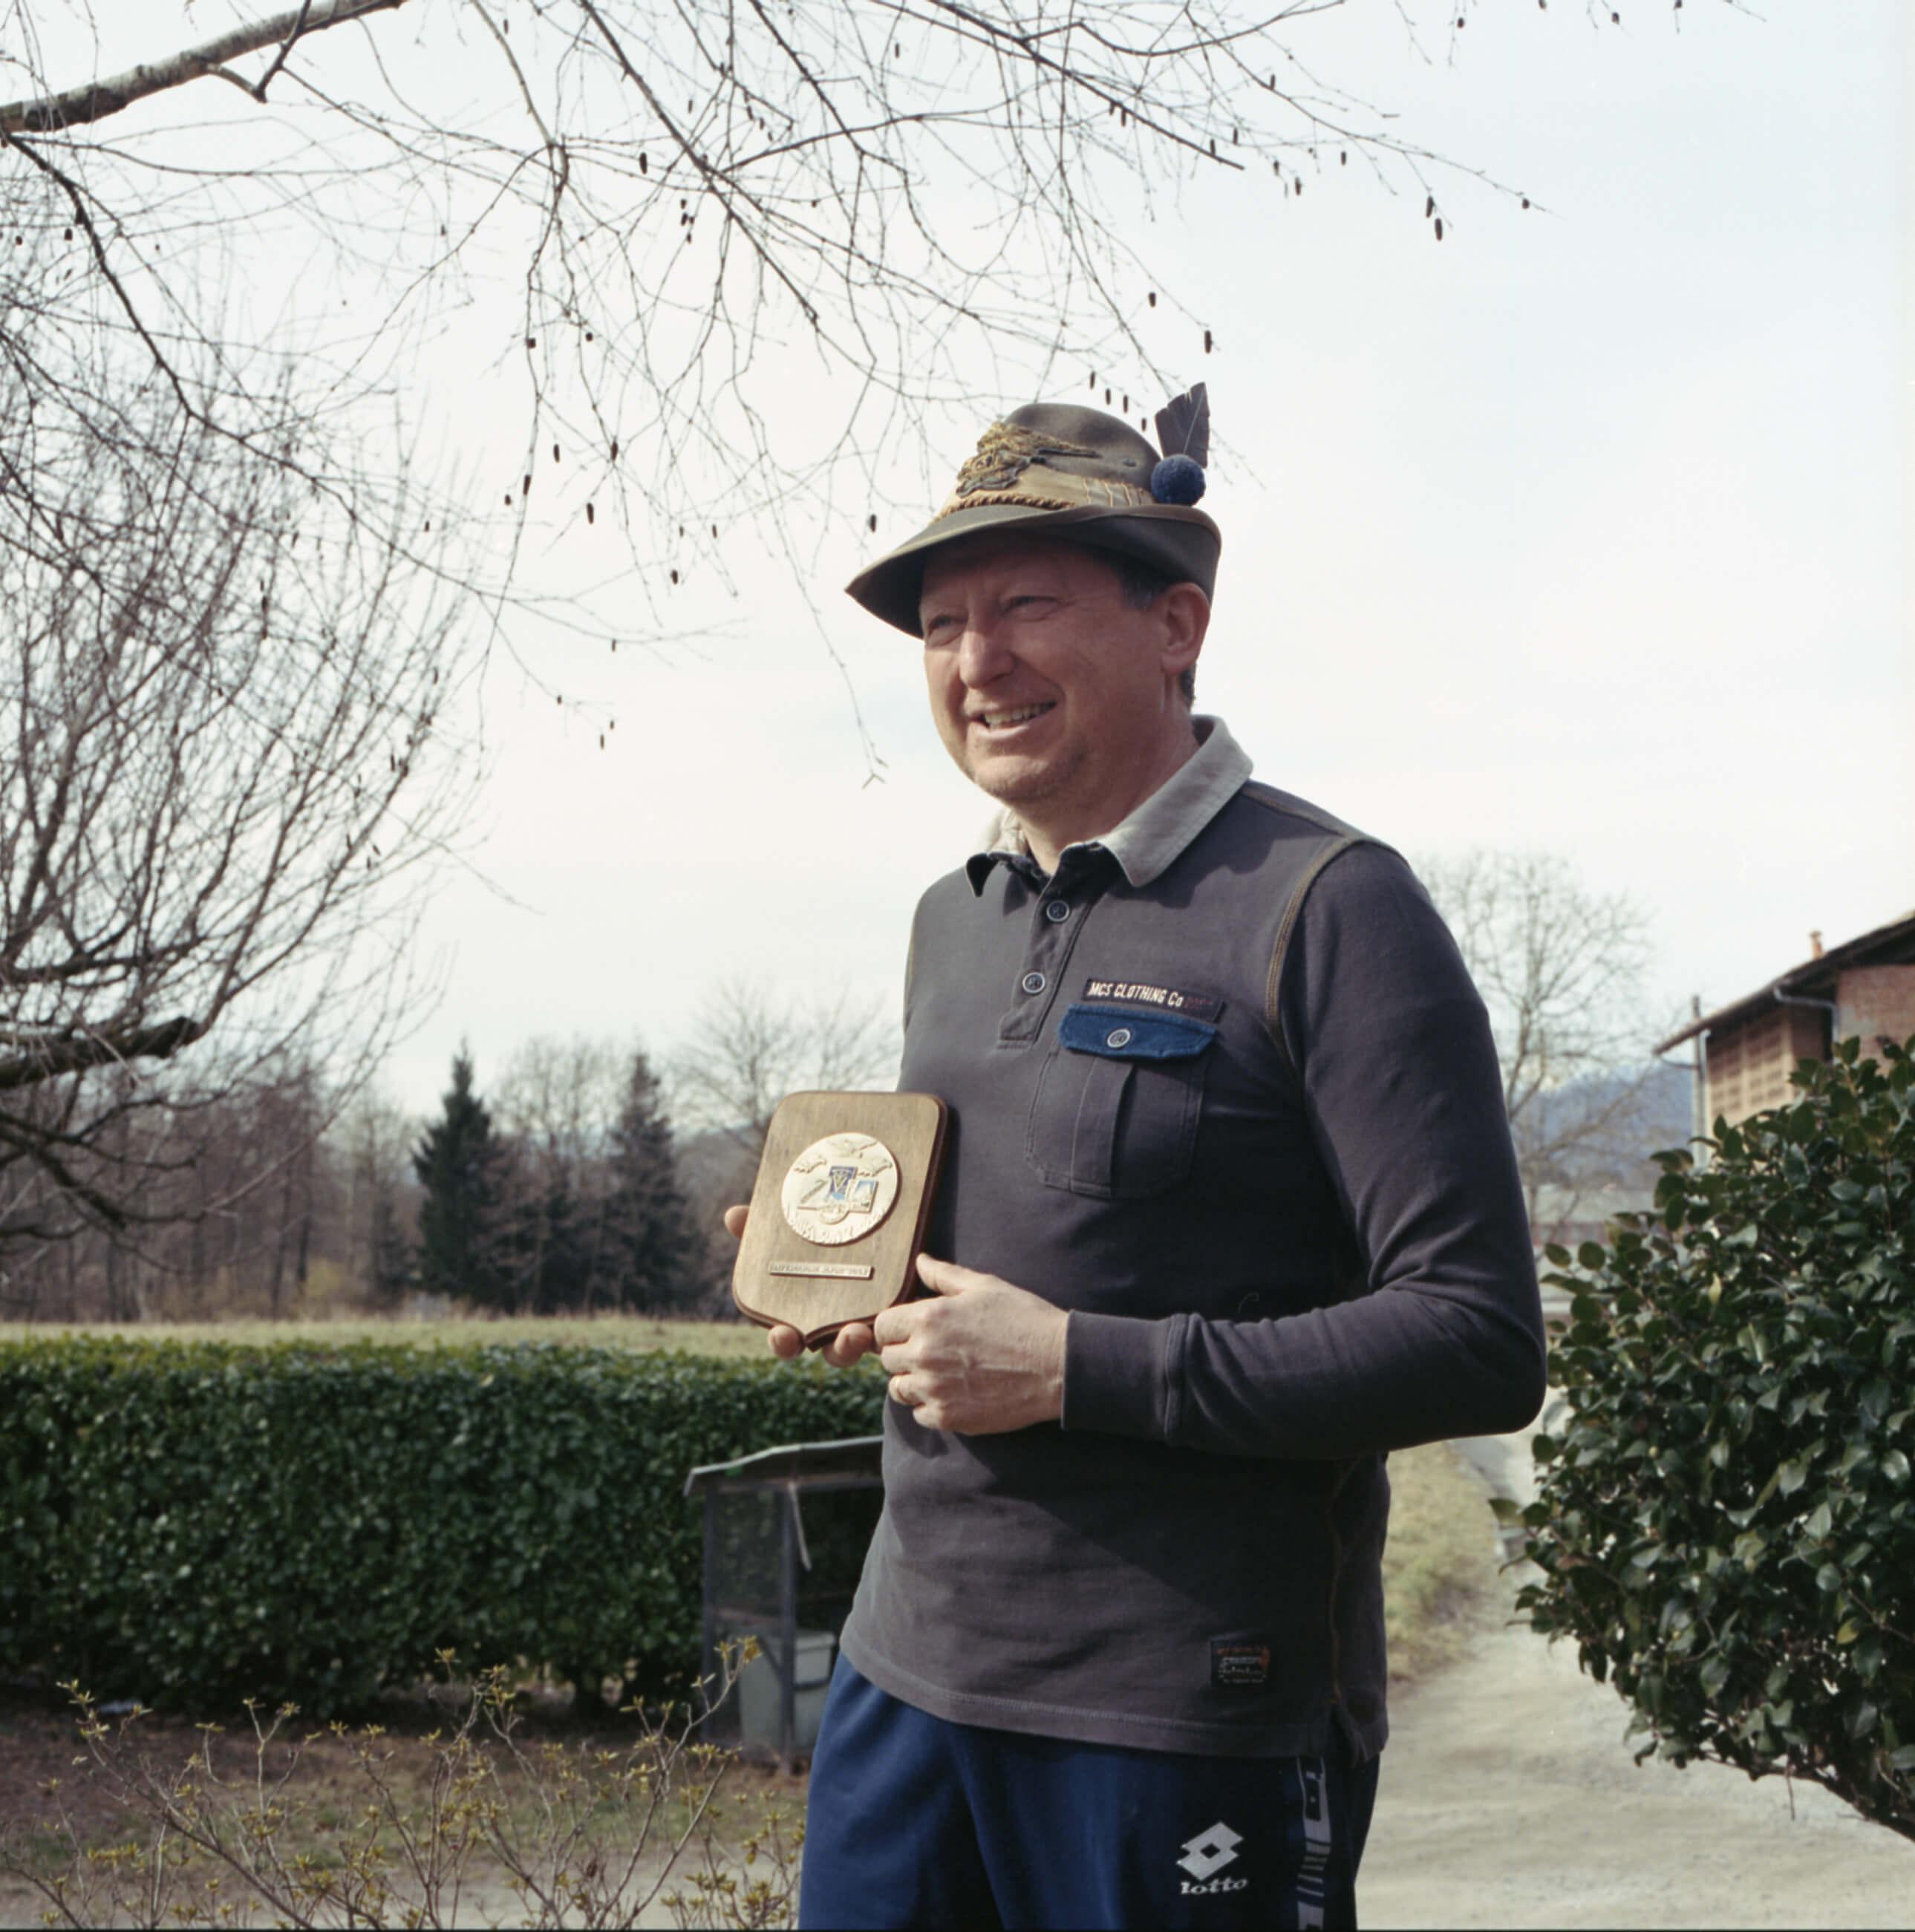 Giulia Simonotti SIAMO TUTTI ALPINI the south west collective of photography portrait of man holding a trophy